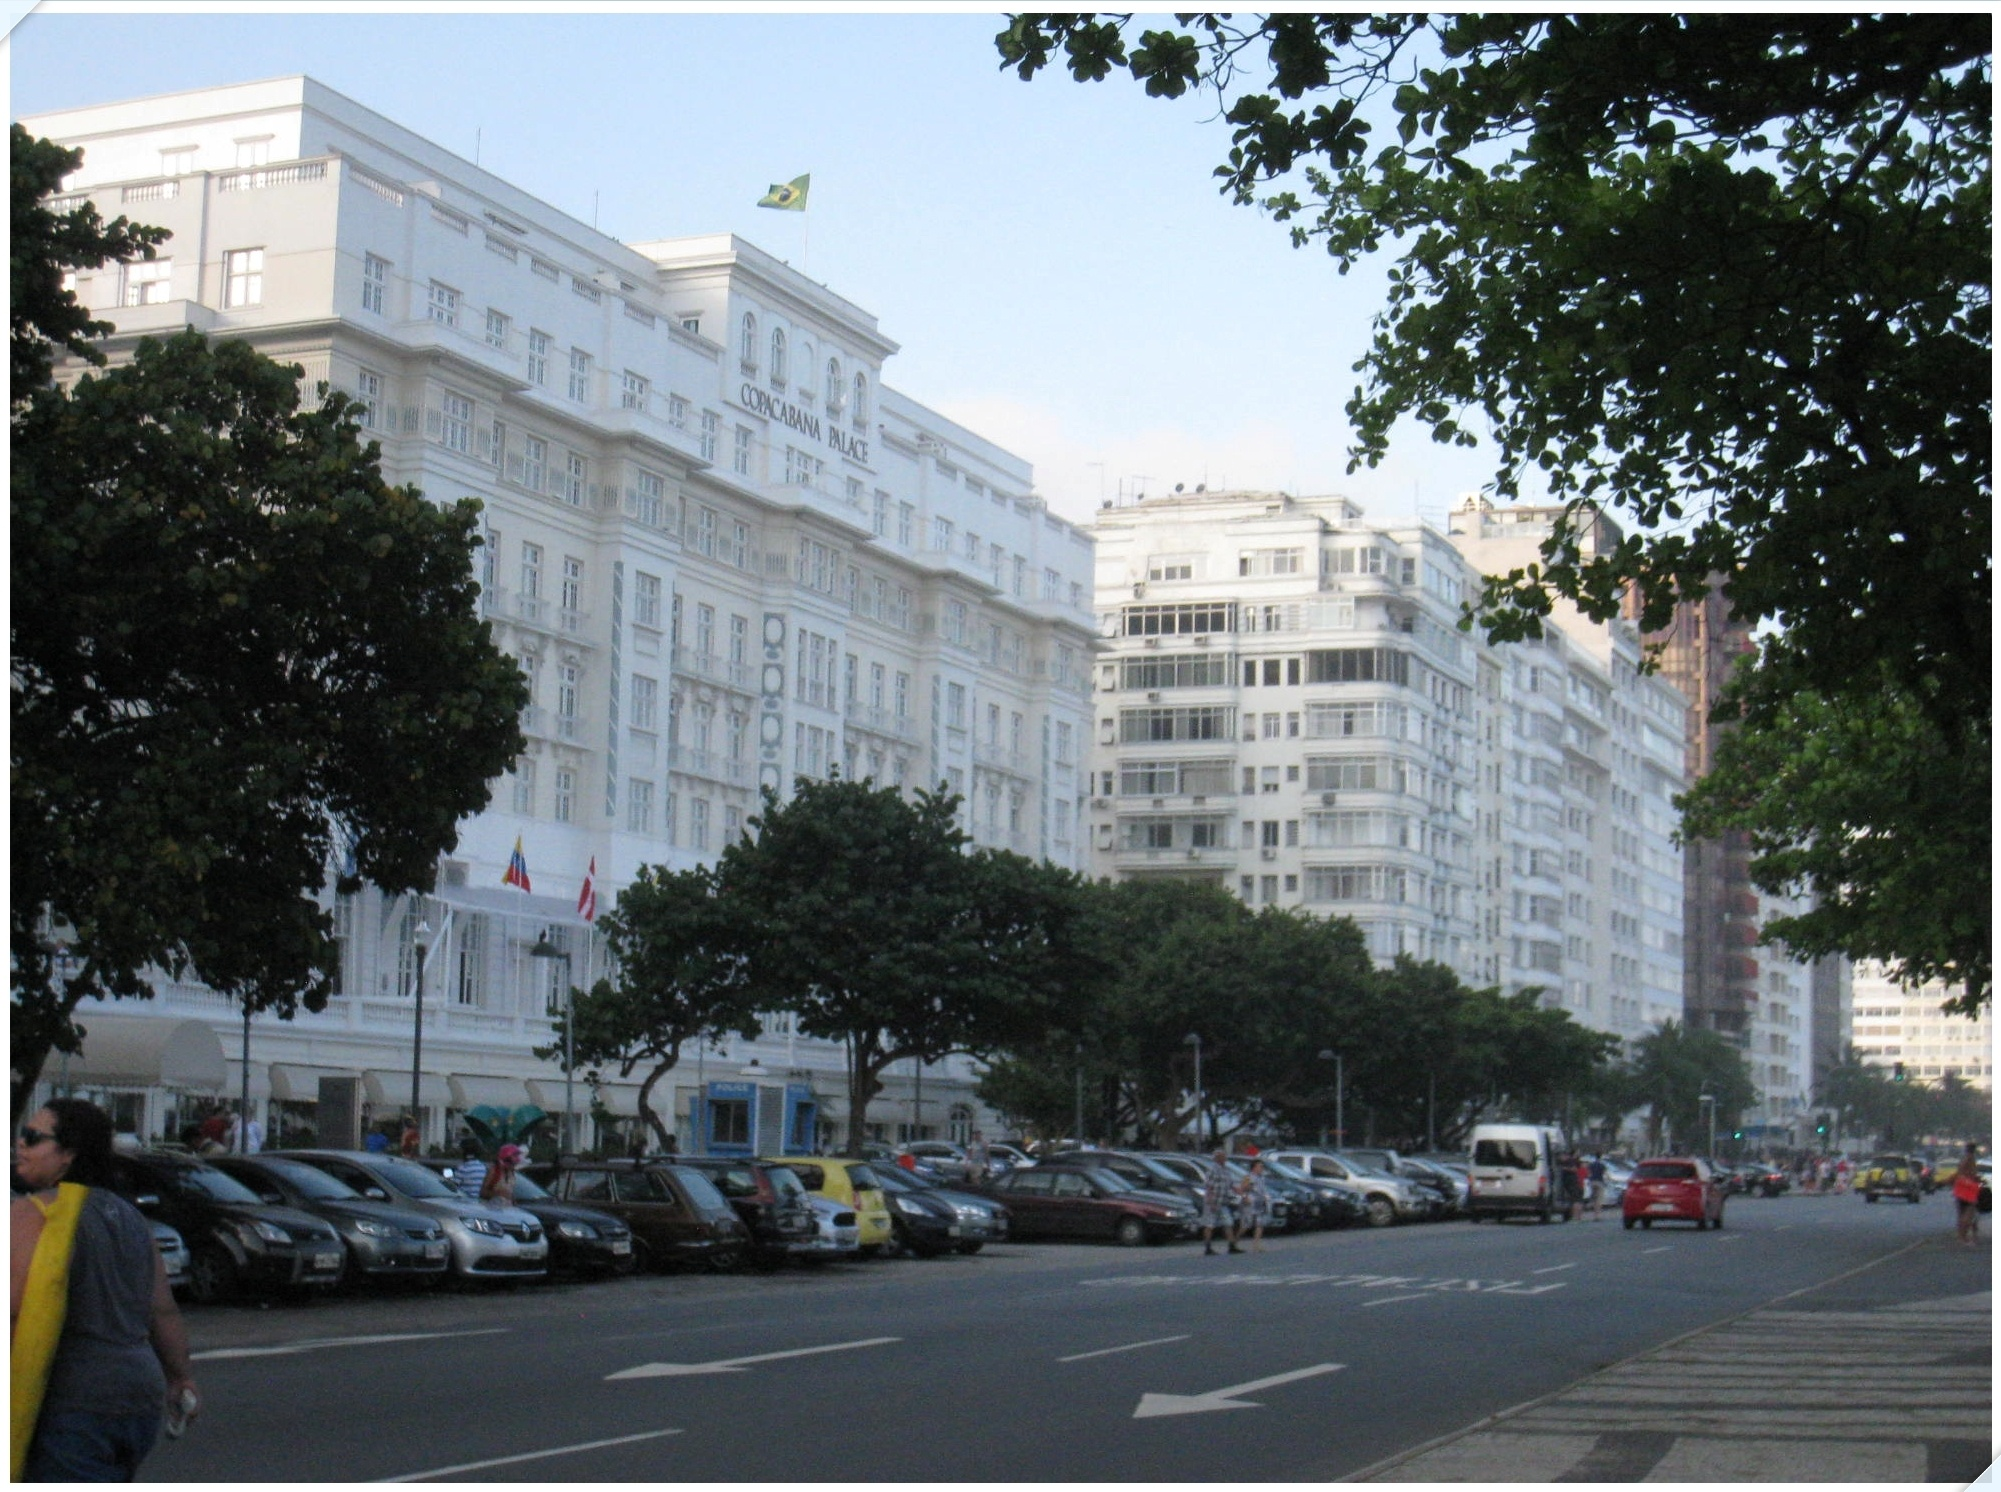 copacabana_6_920.jpg